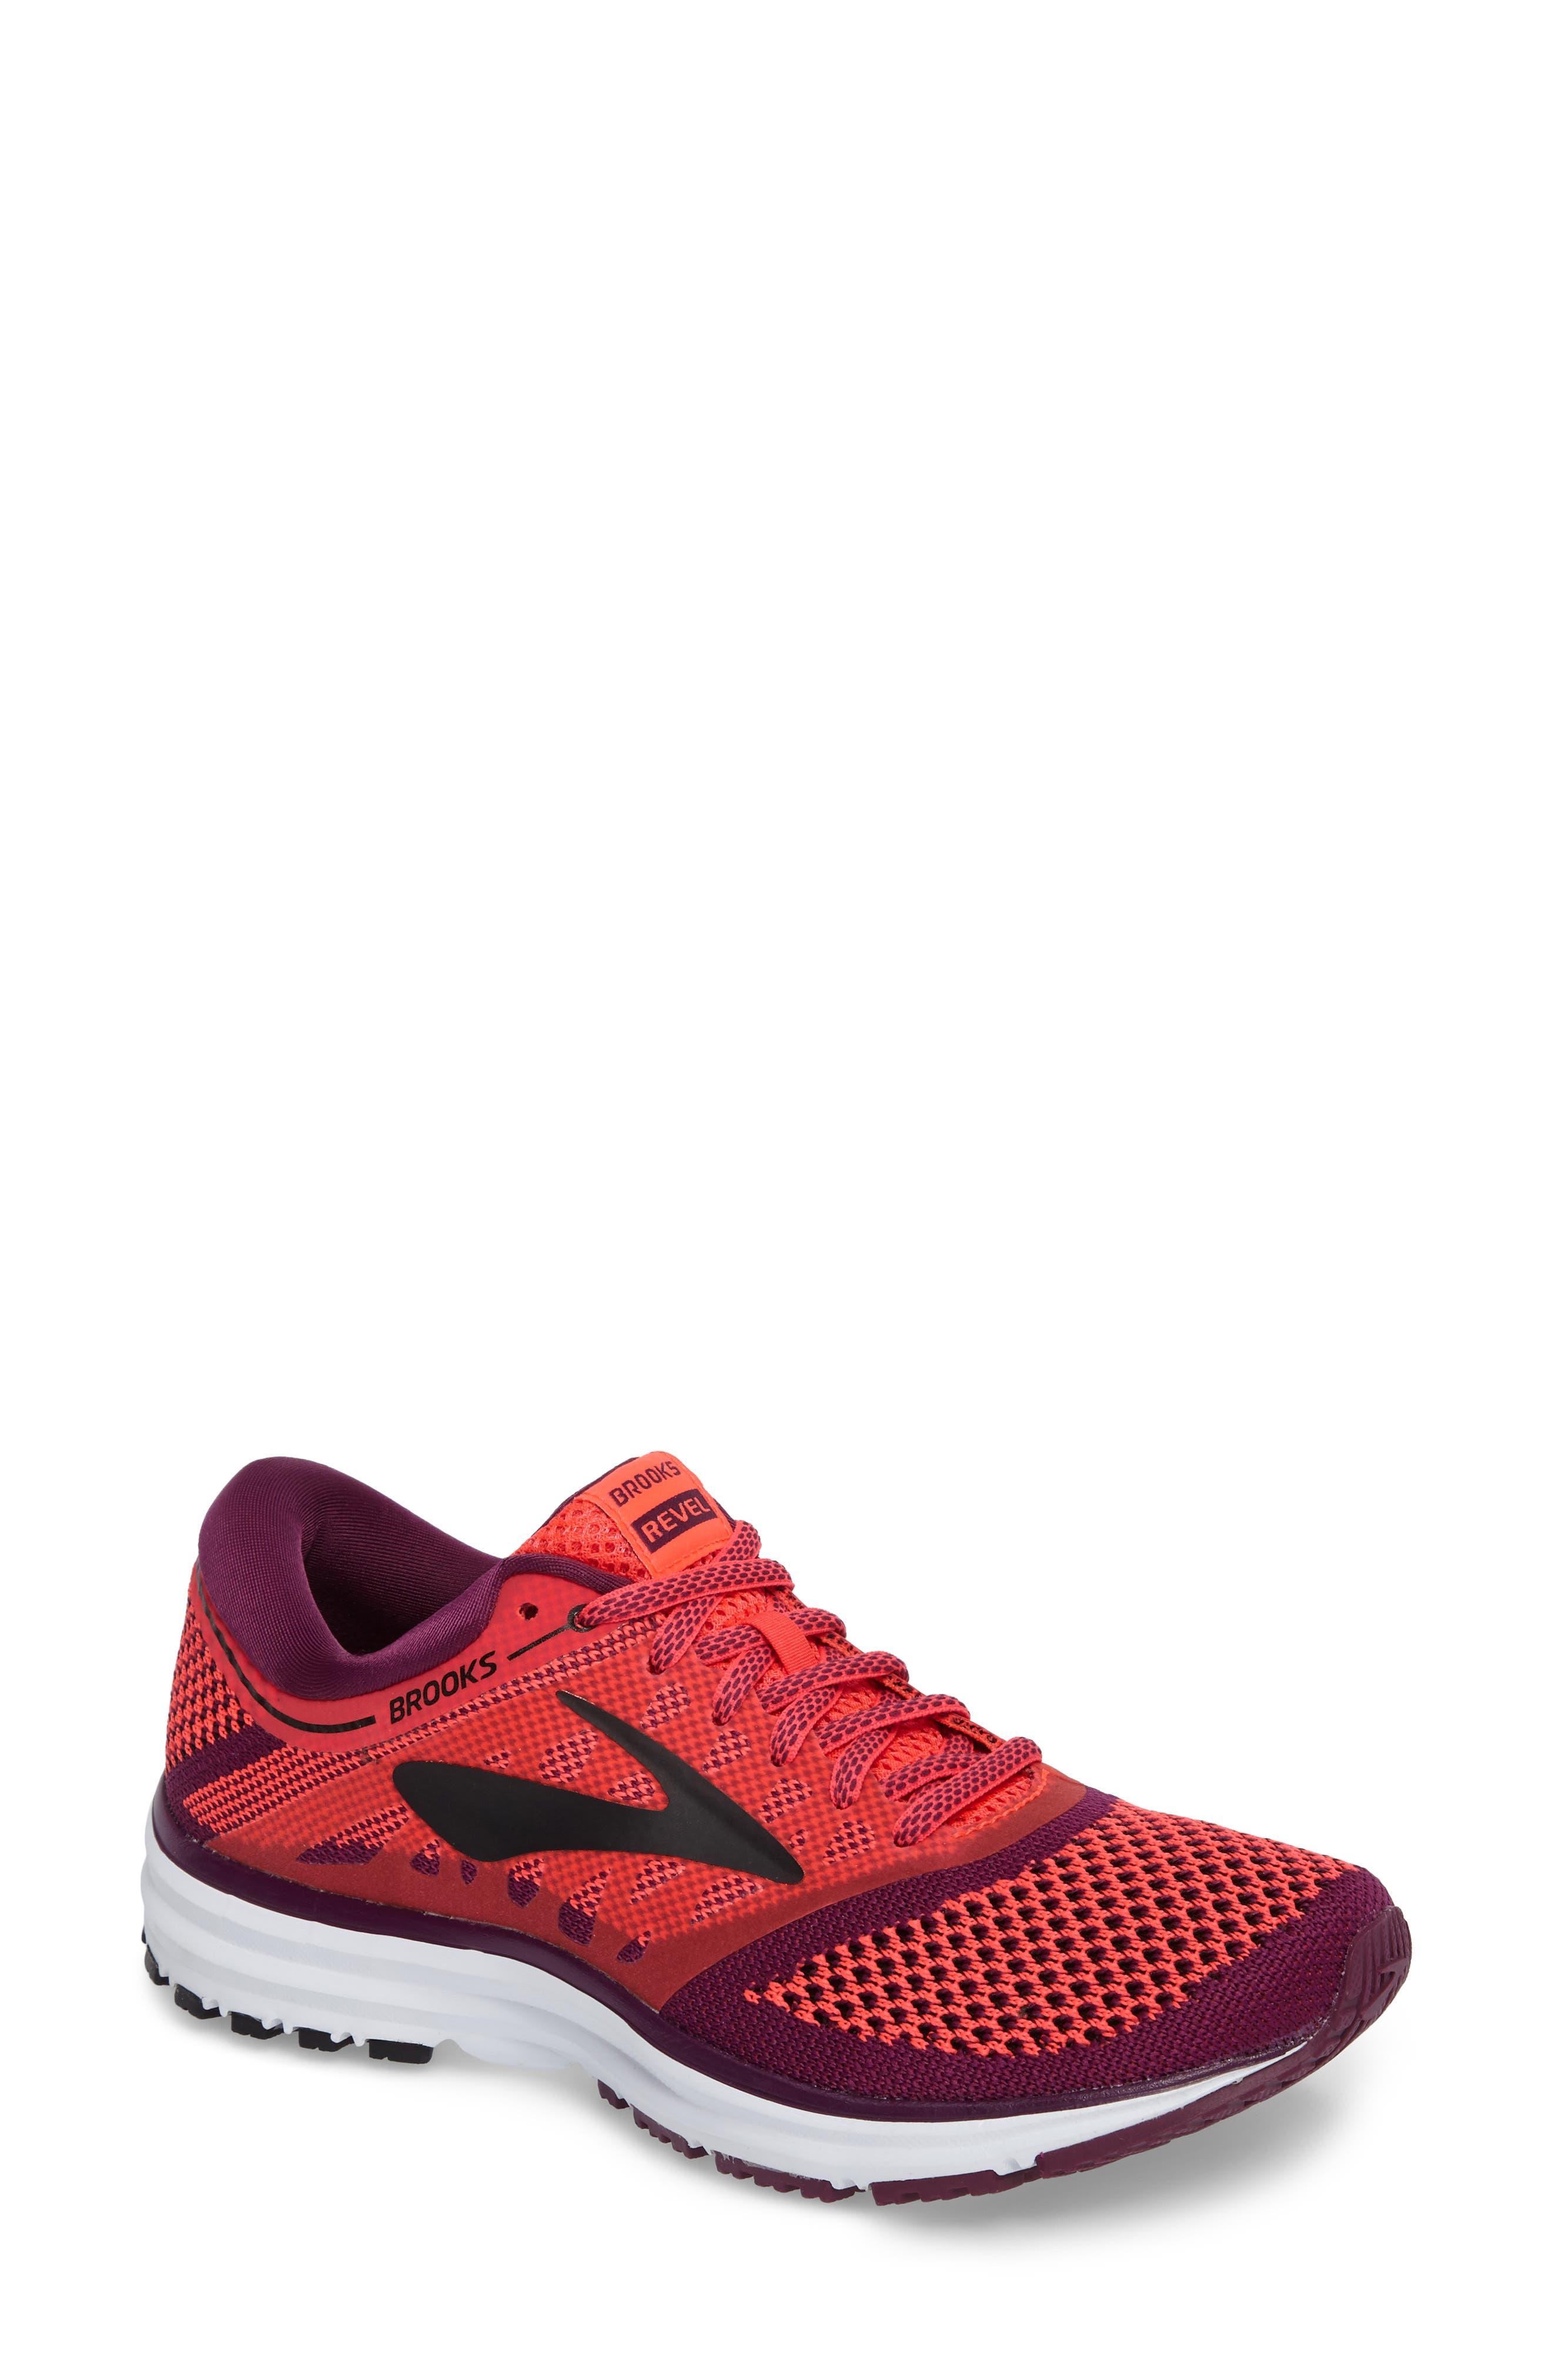 Revel Running Shoe,                             Main thumbnail 6, color,